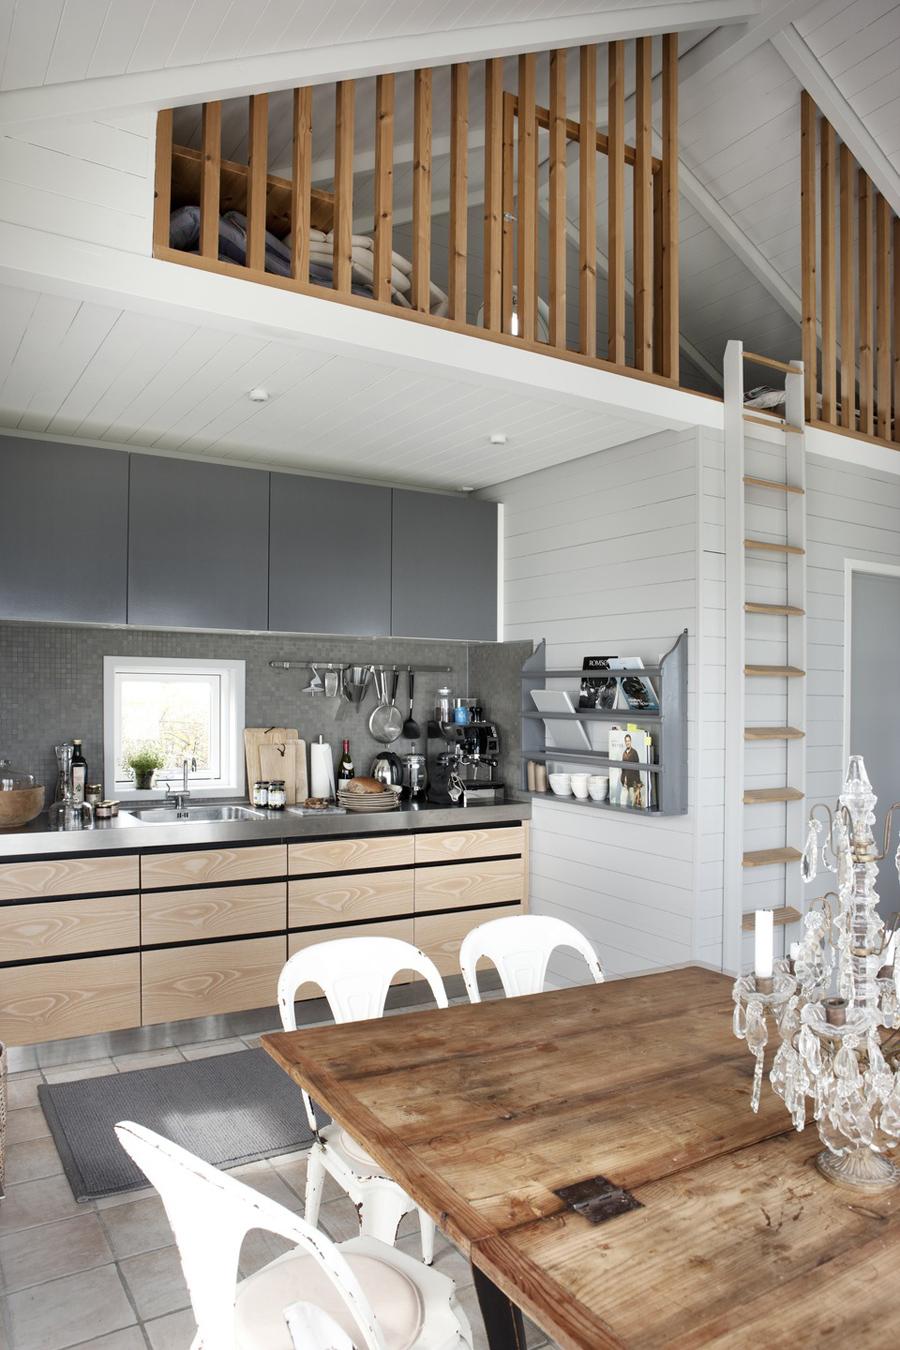 15 bellissime idee per il soppalco. Black Bedroom Furniture Sets. Home Design Ideas